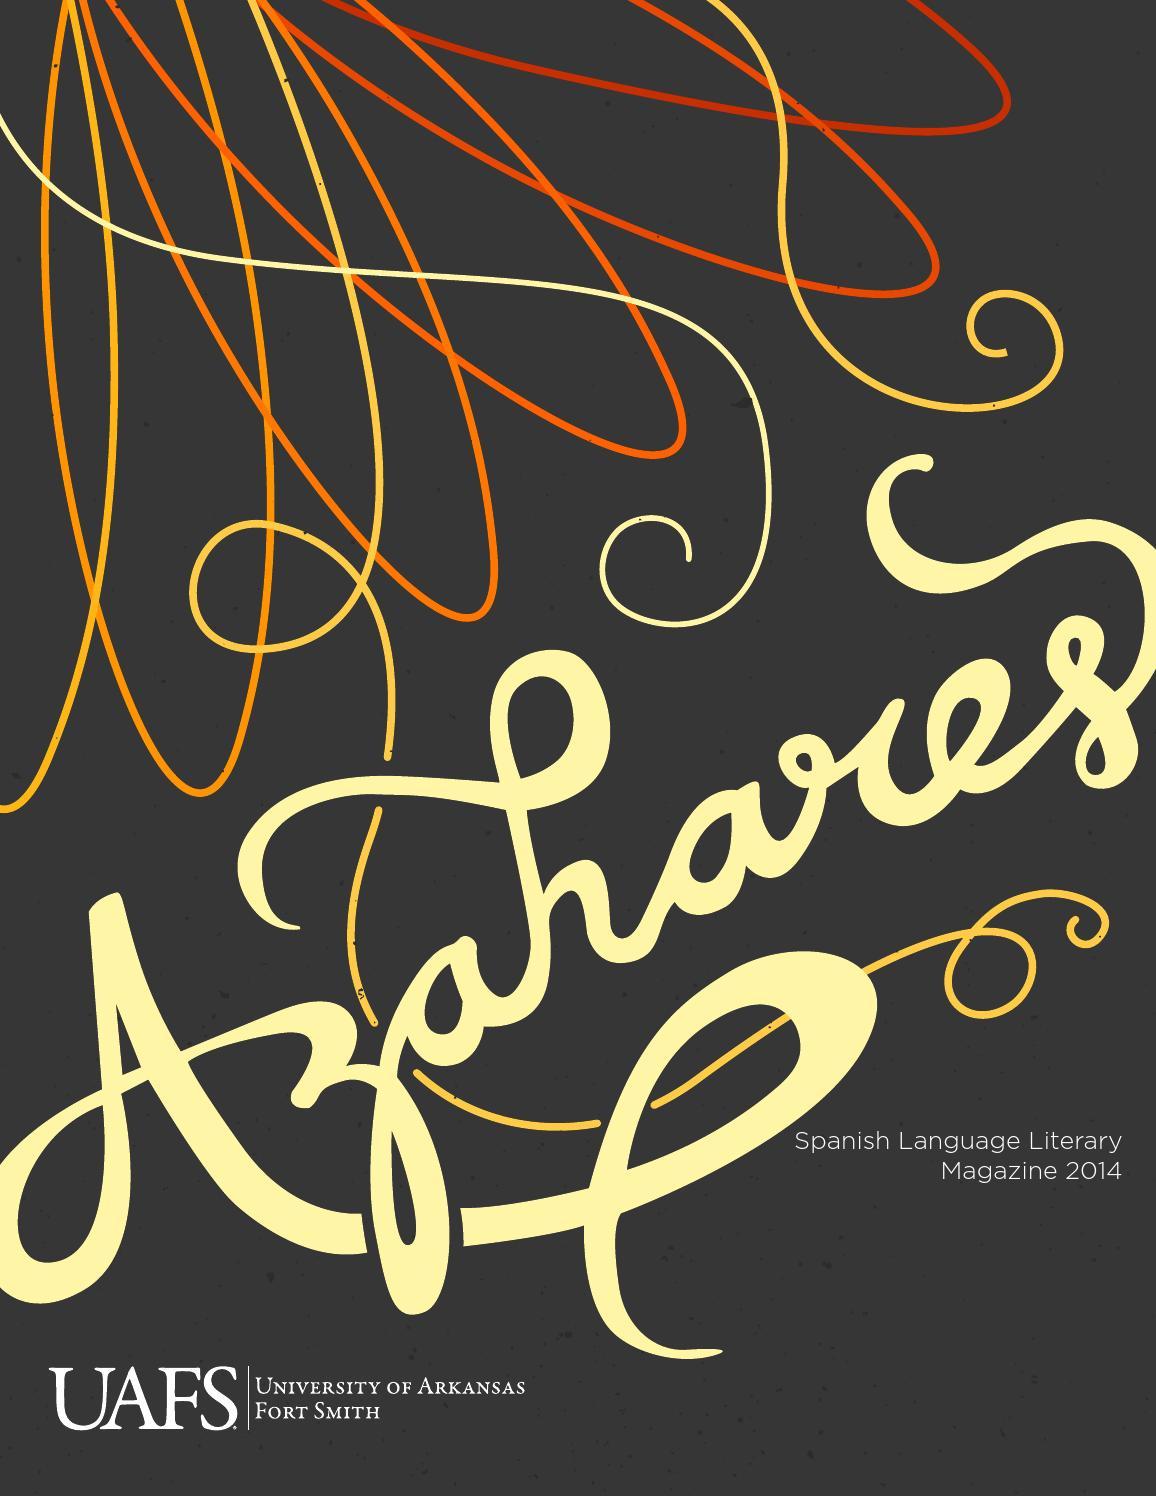 UAFS Azahares 2014 by University of Arkansas - Fort Smith - issuu